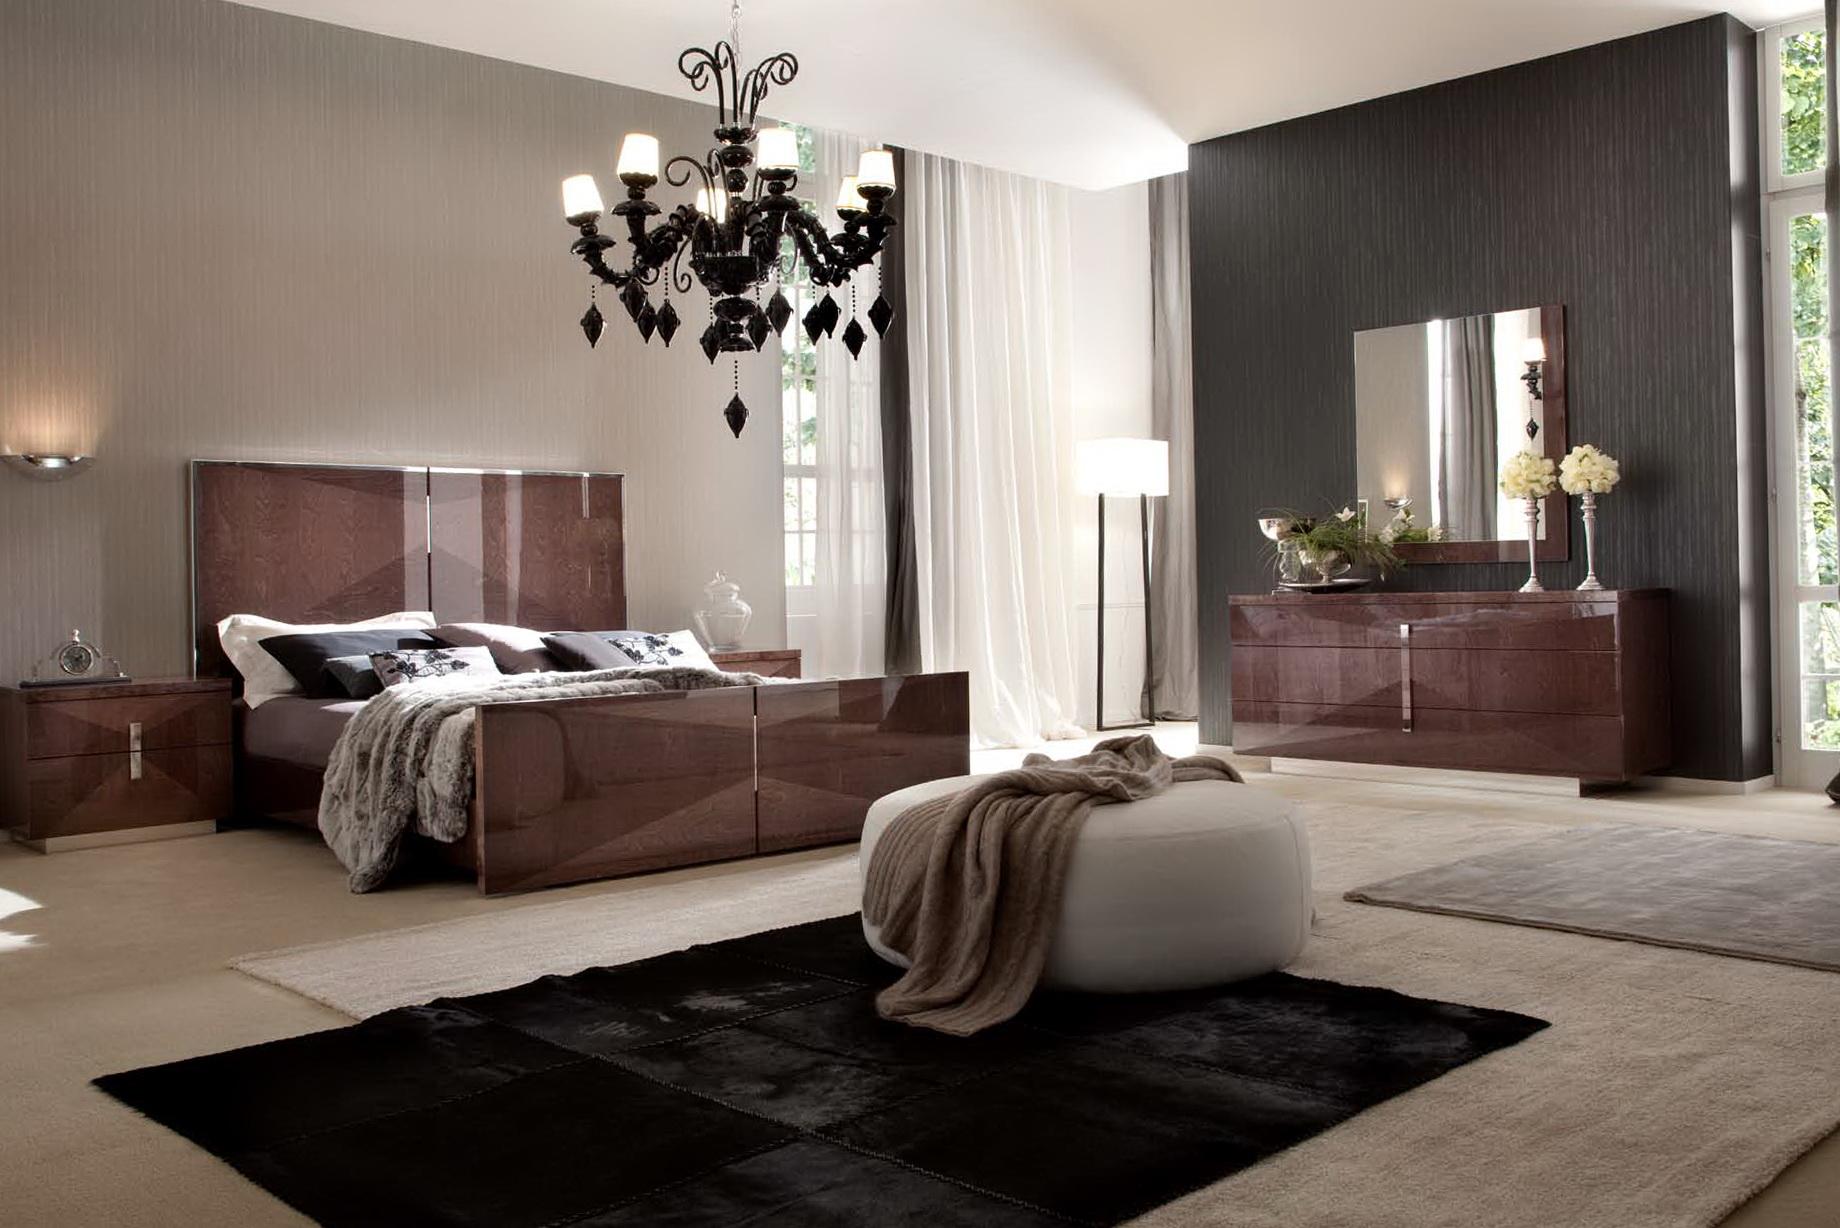 Modern Chandeliers For Bedrooms